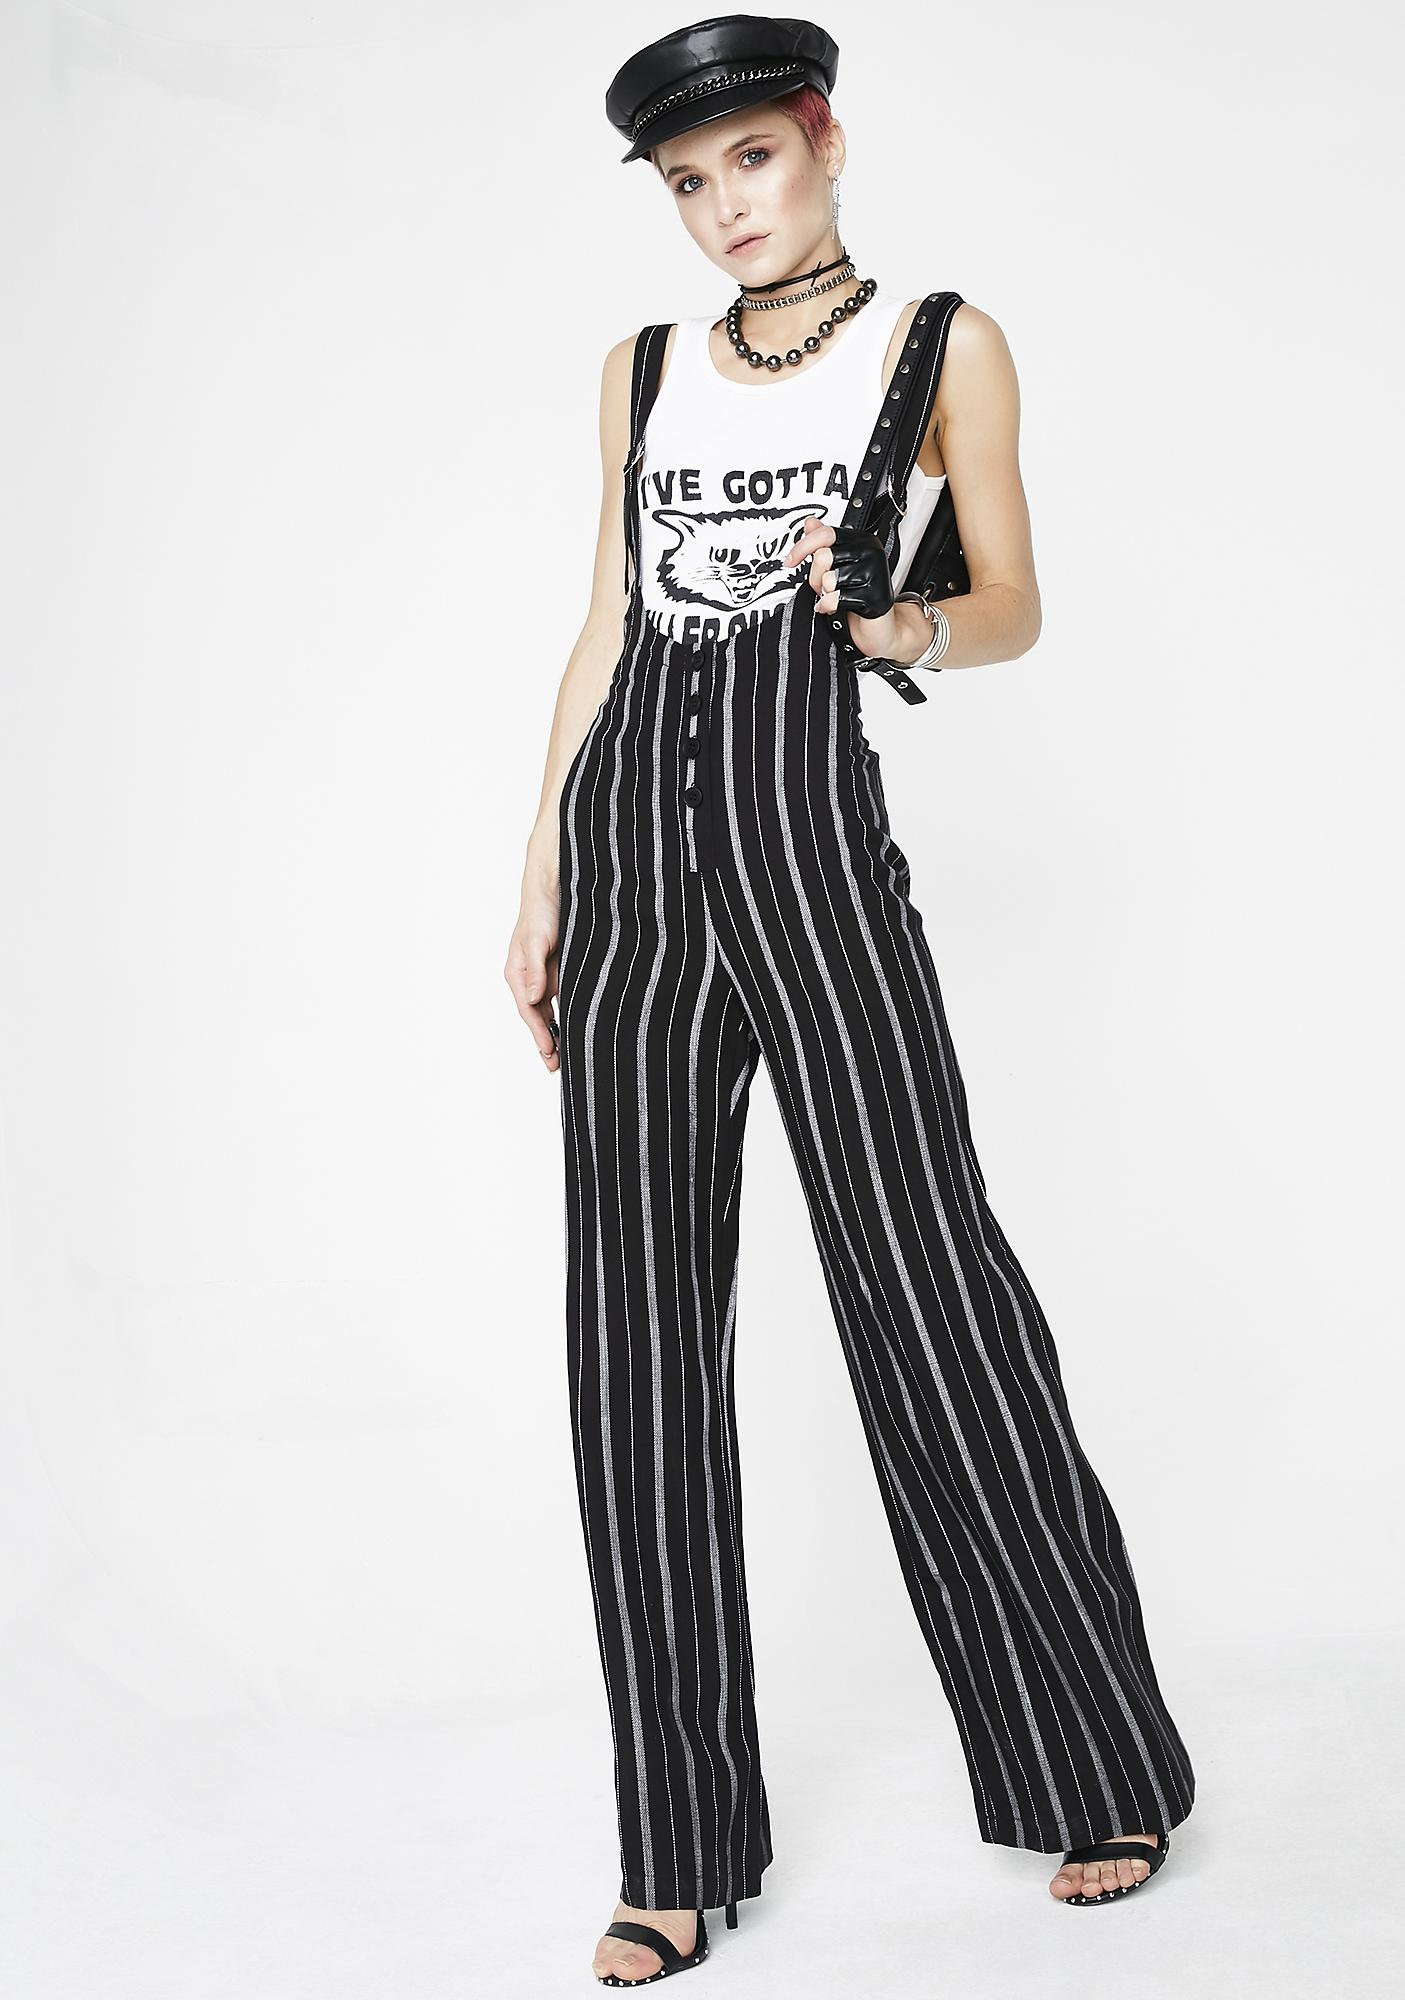 Killer Instincts Striped Jumpsuit by Dress Forum